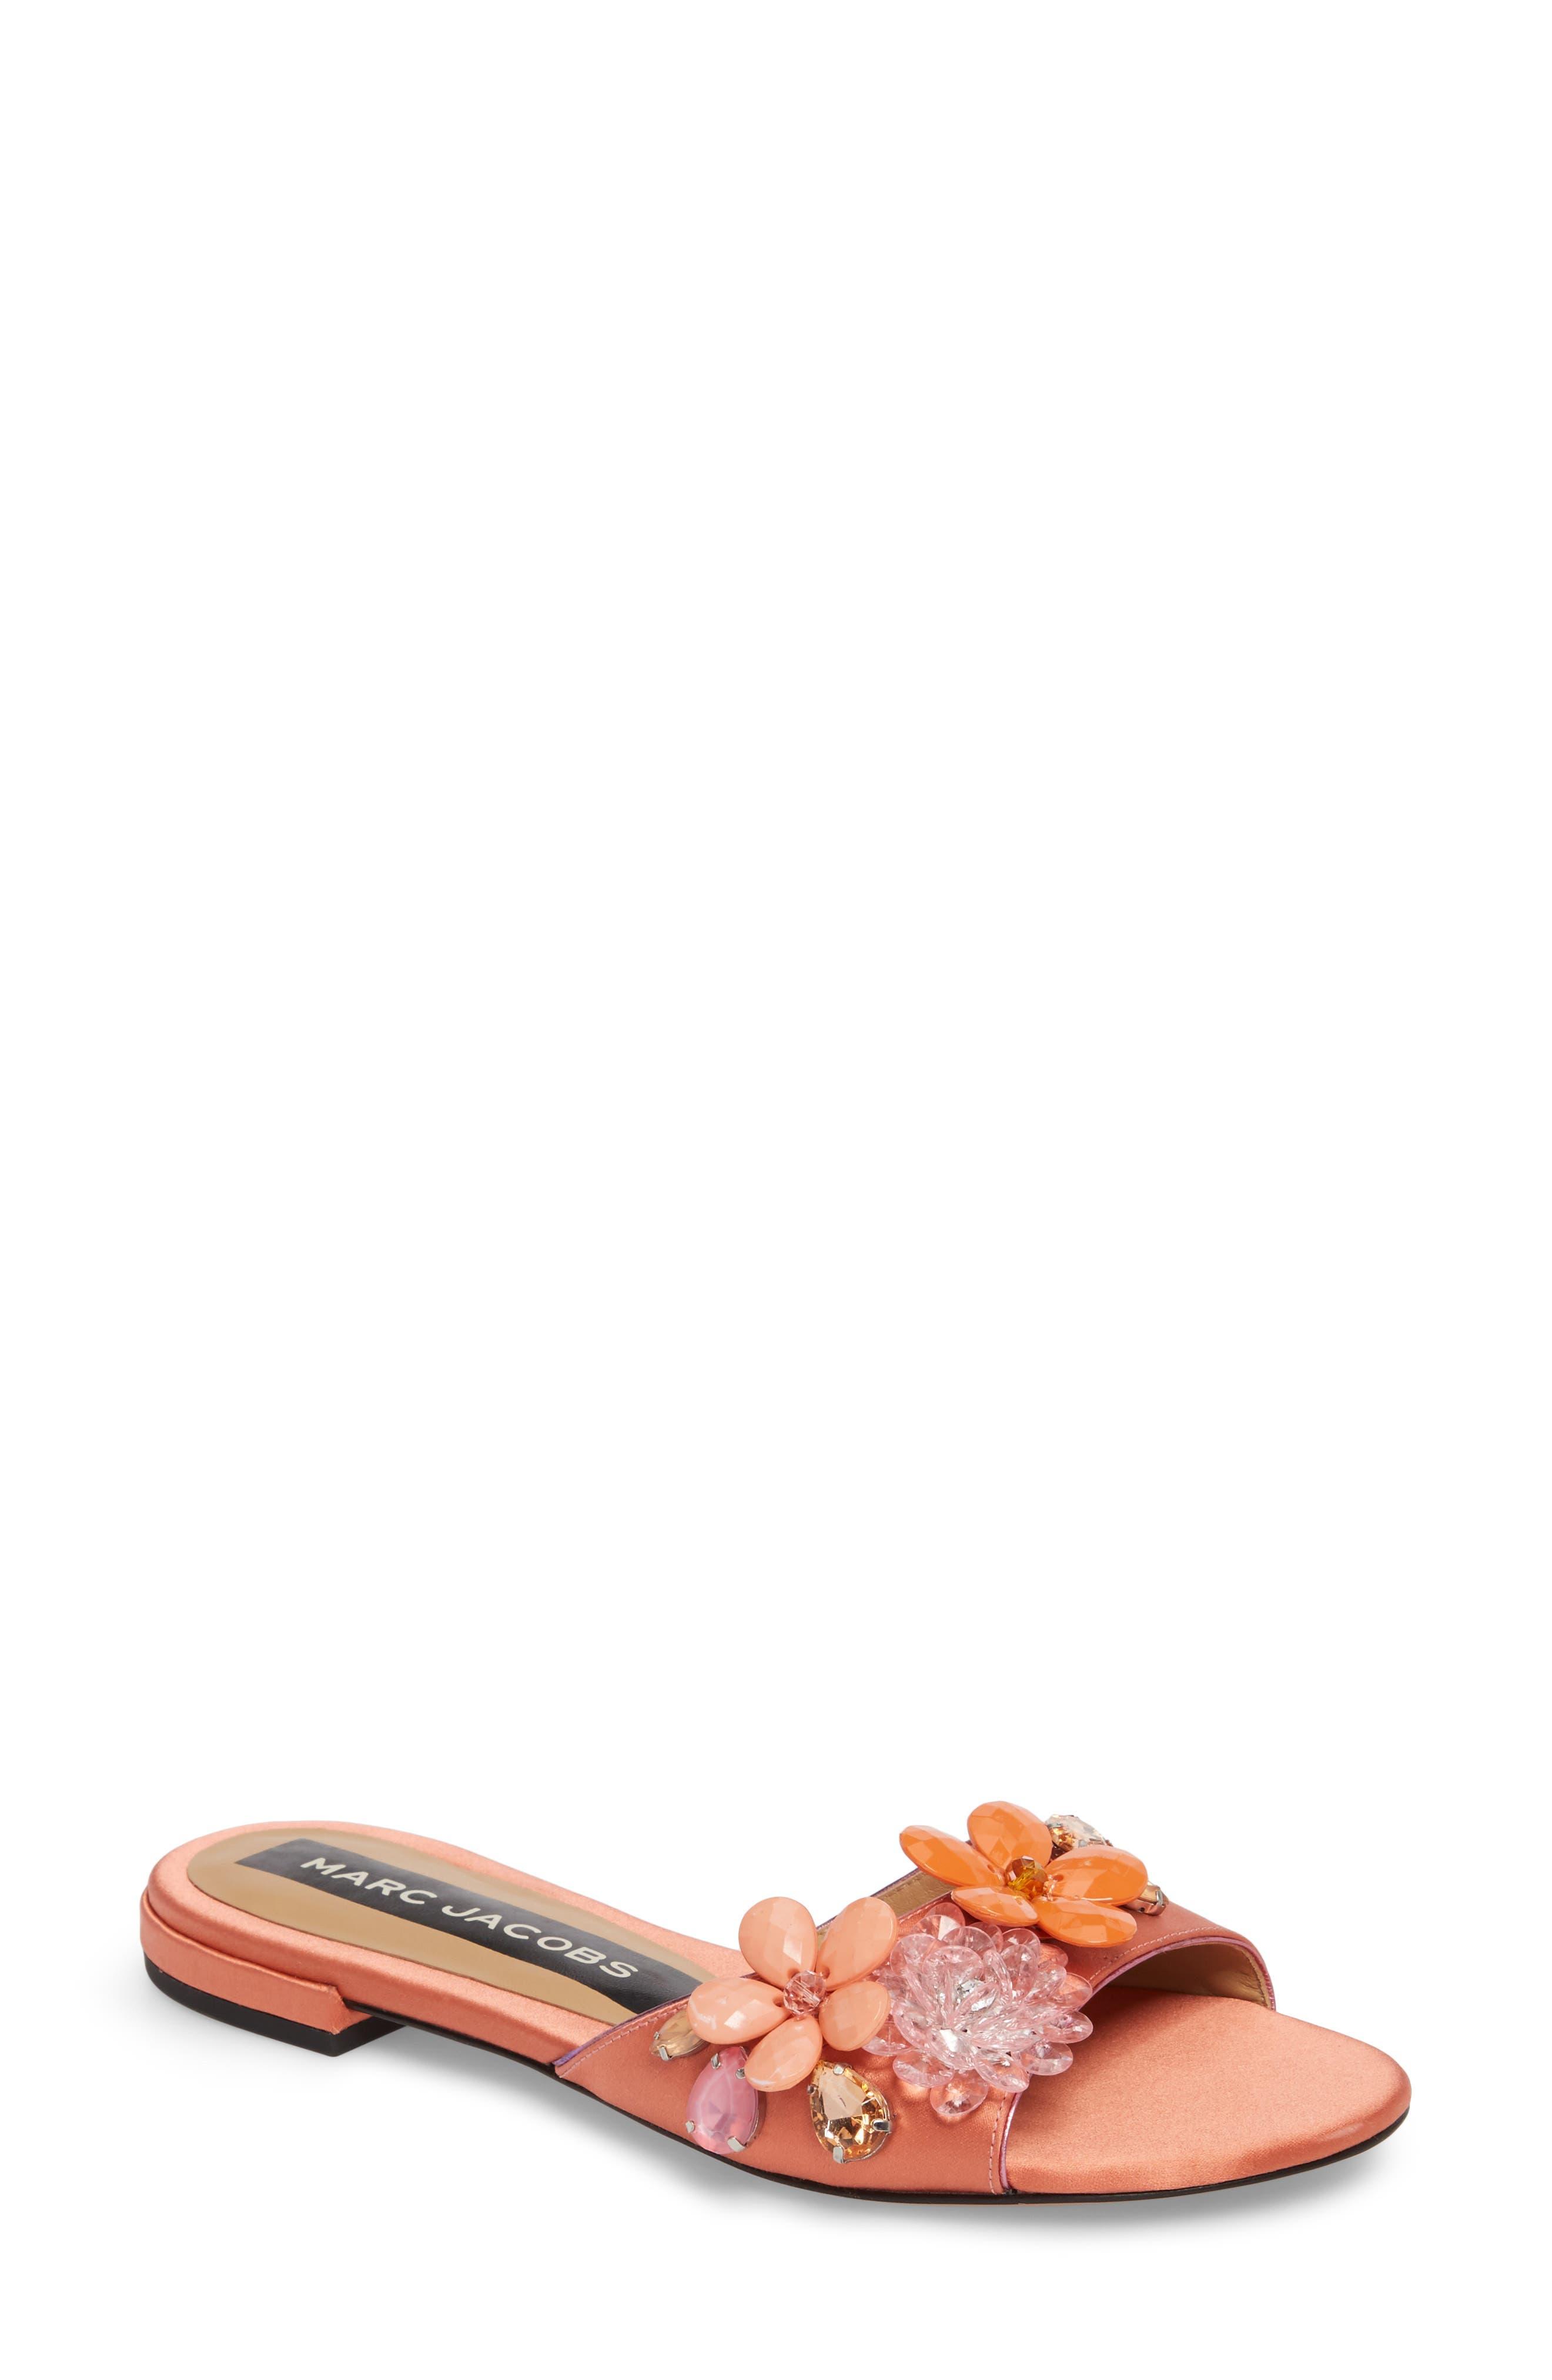 Clara Embellished Slide Sandal,                             Main thumbnail 1, color,                             659